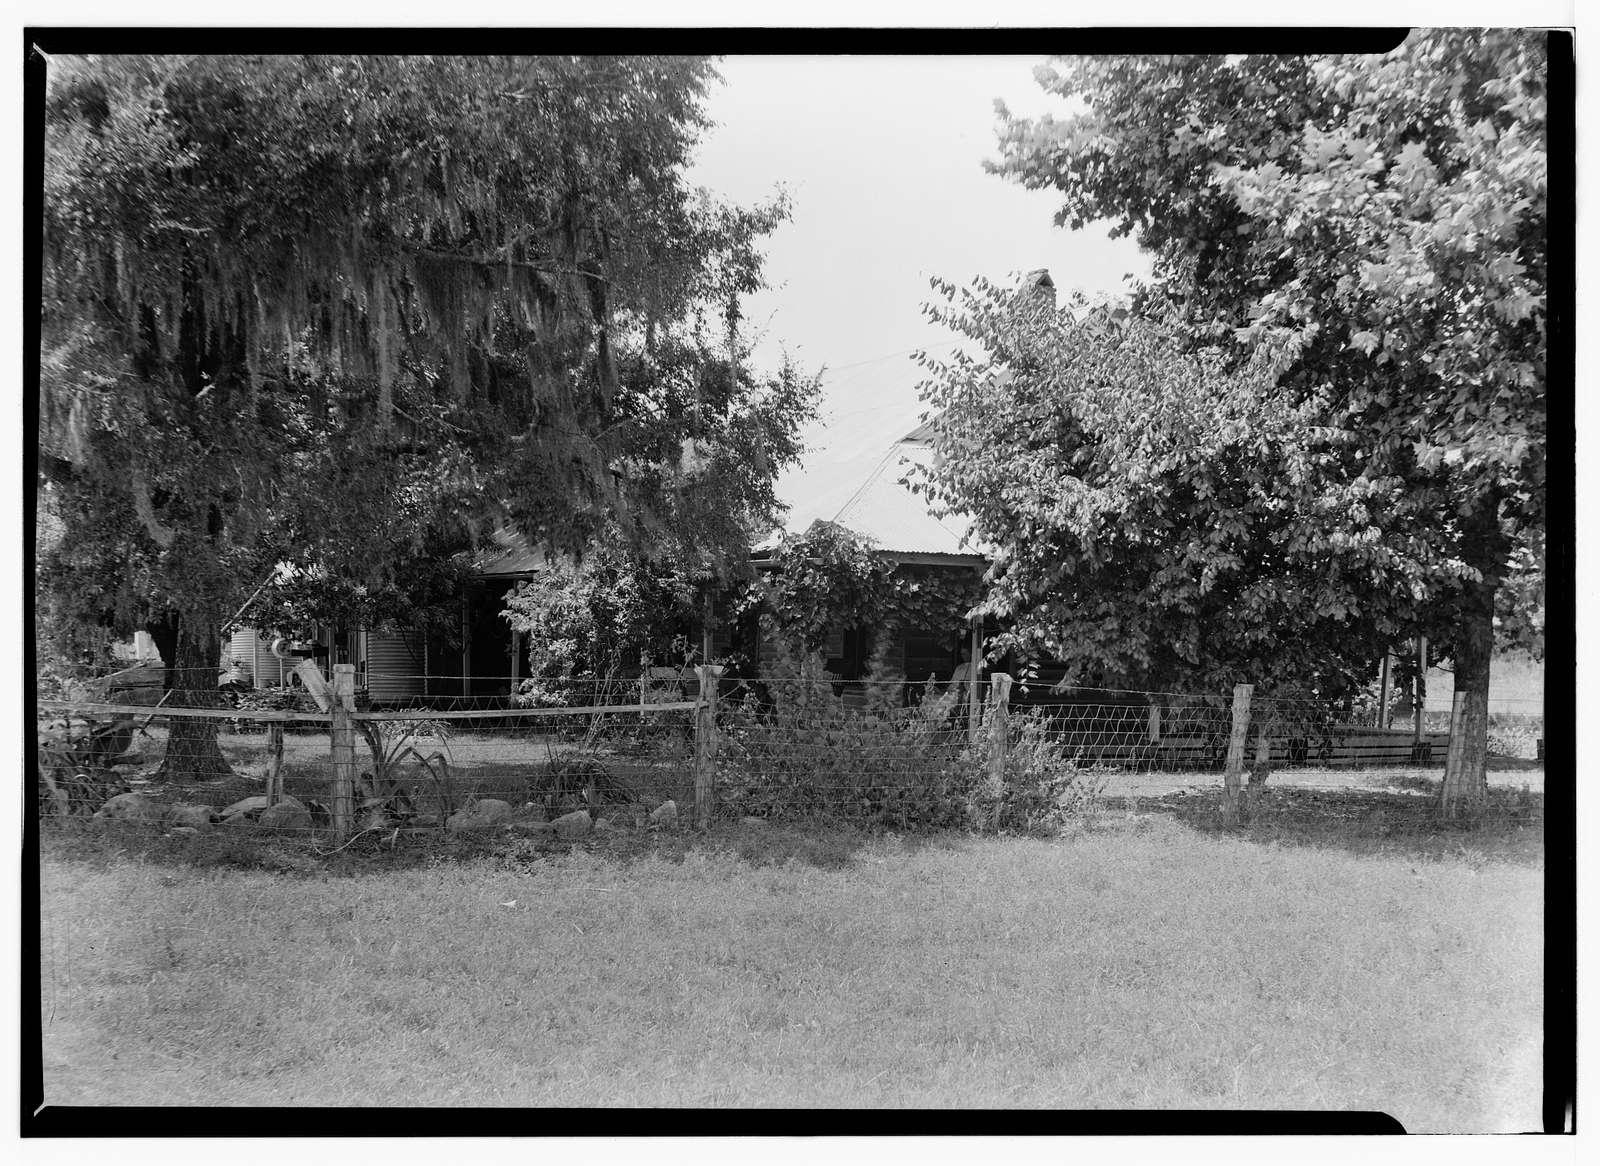 Markey's Seminary Dormitory, West edge of Plantersville, Plantersville, Grimes County, TX